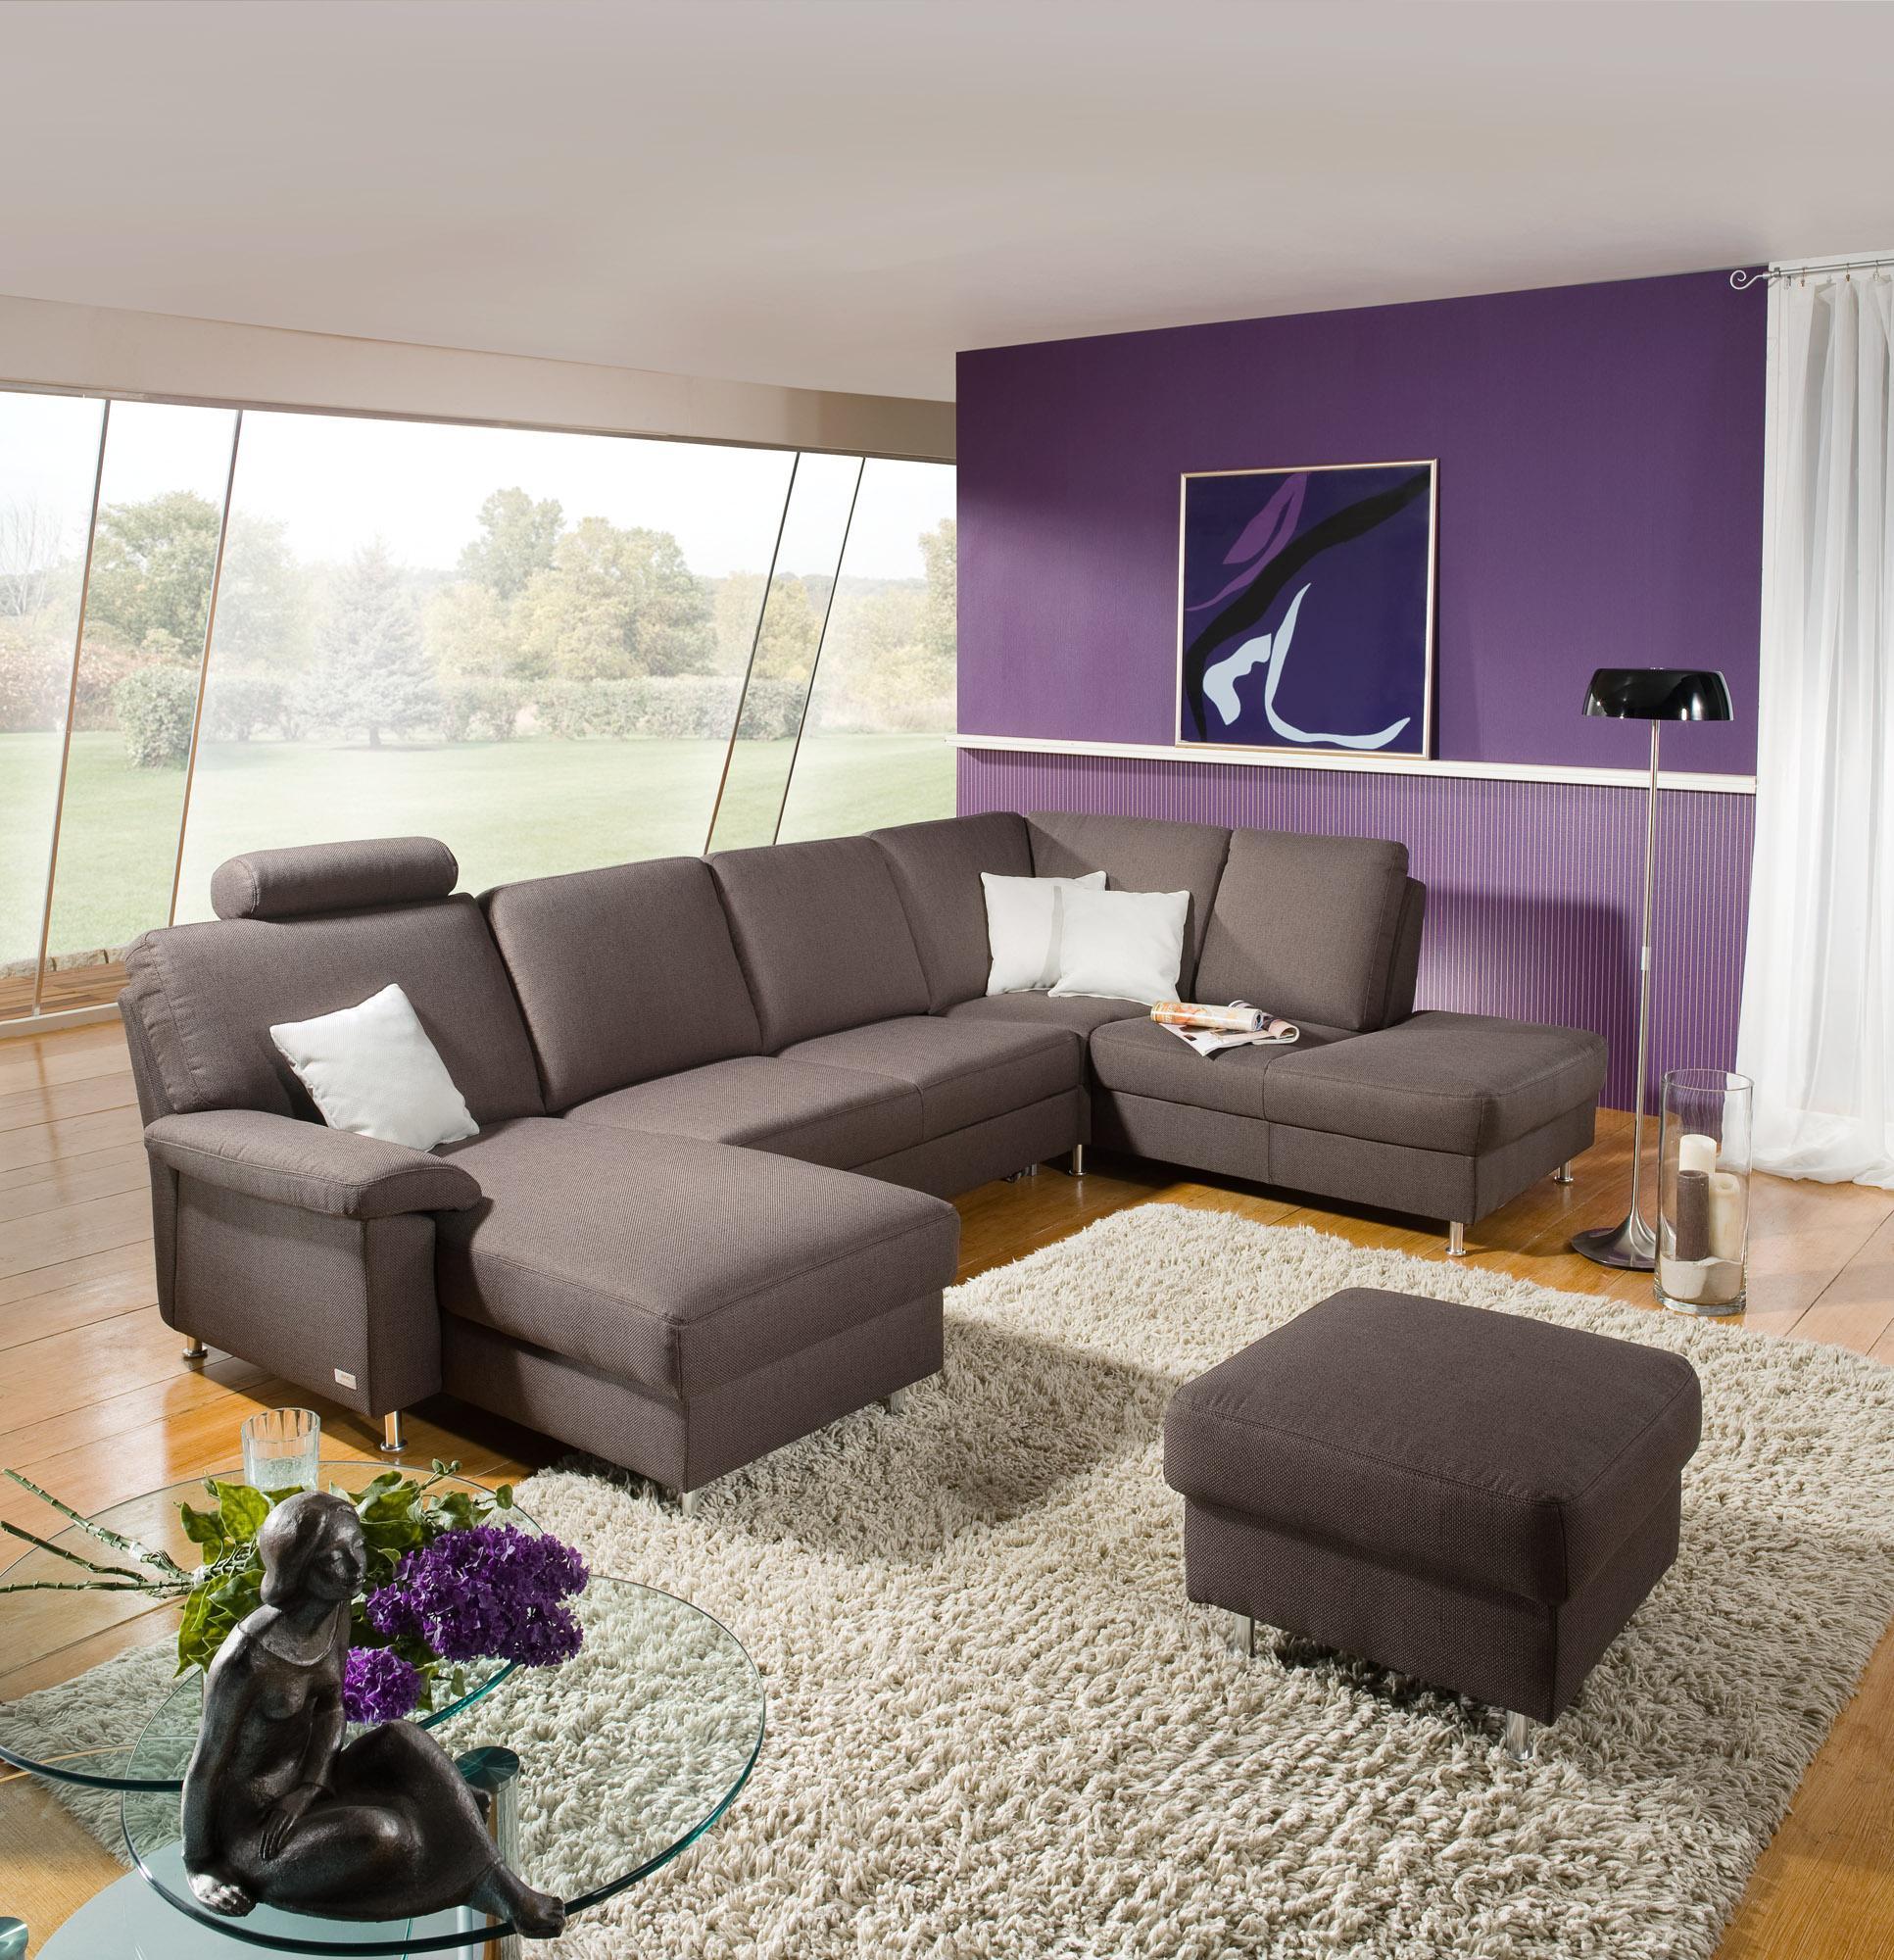 klassische sofas im best oscar victorian samtsofa with klassische sofas im awesome und sofa in. Black Bedroom Furniture Sets. Home Design Ideas